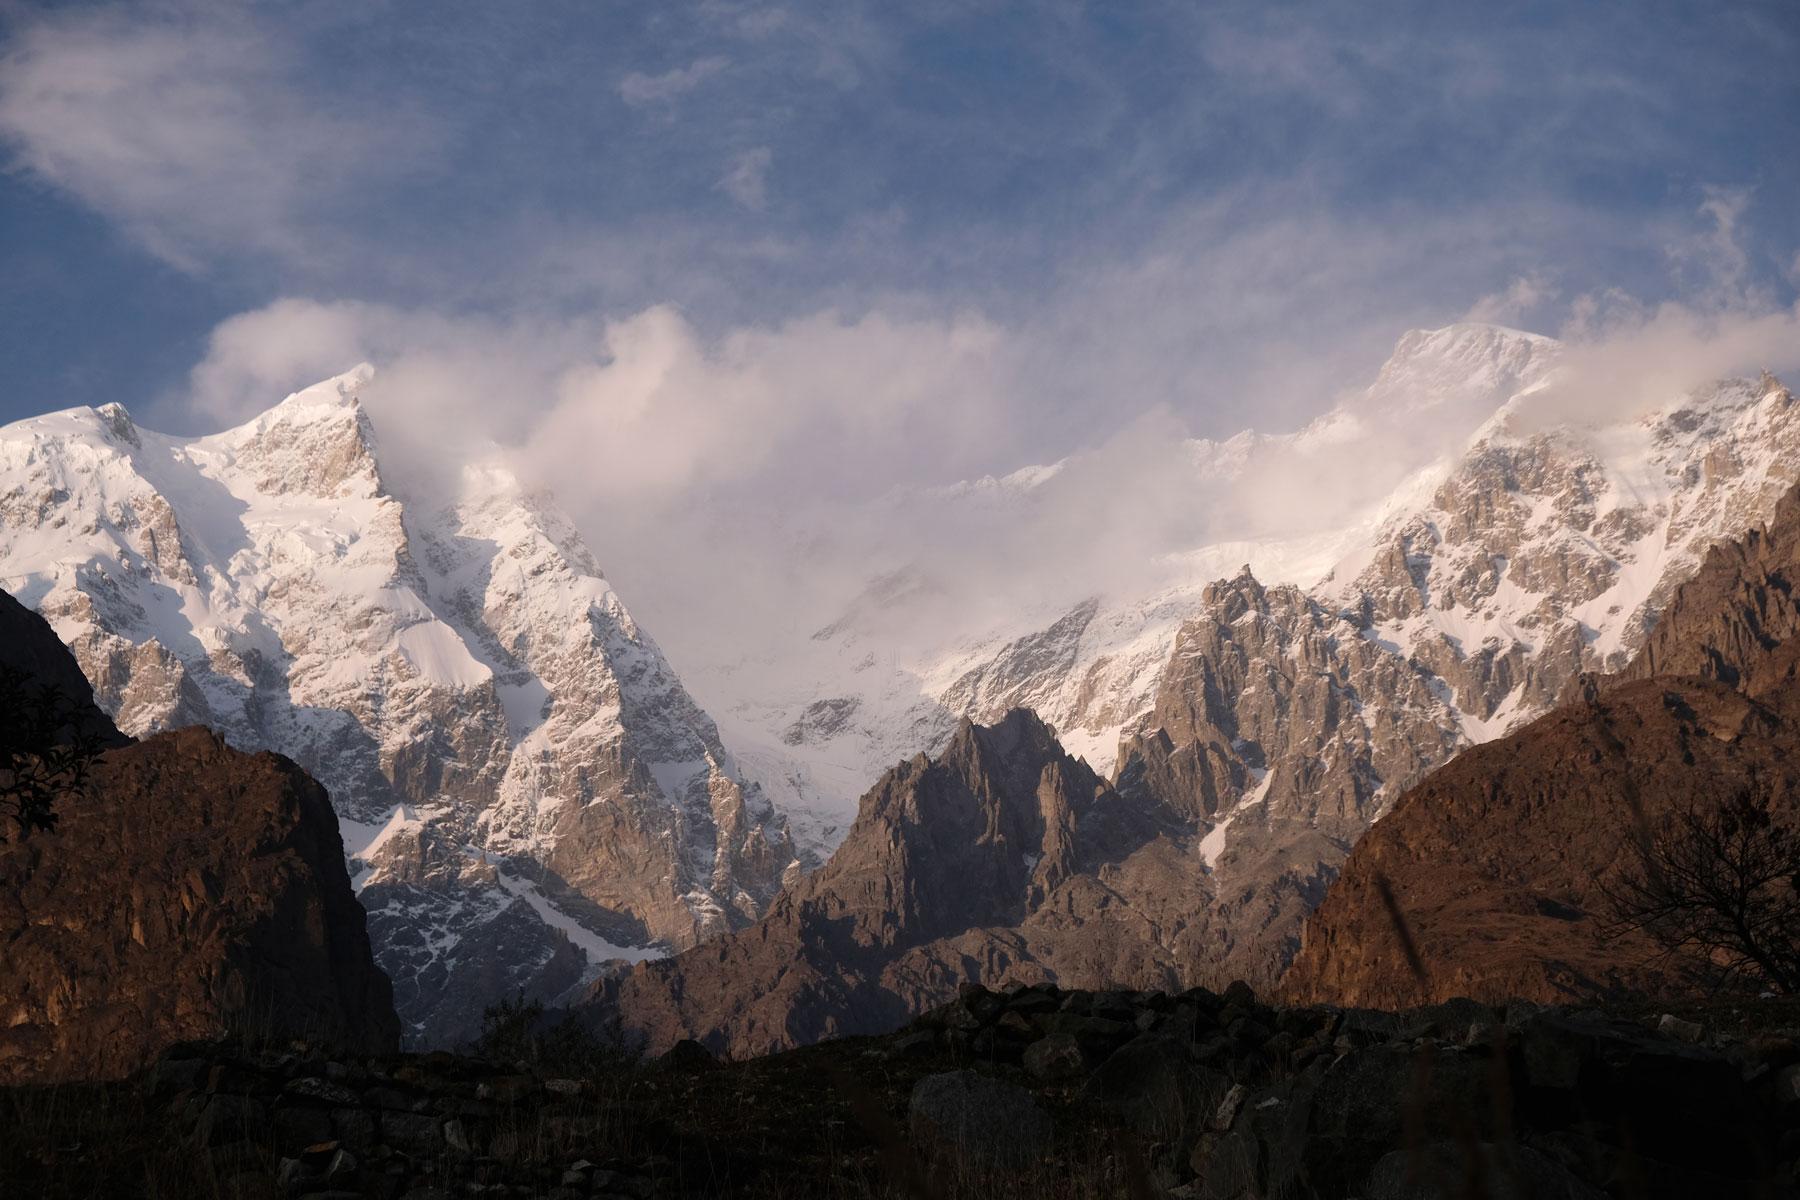 Schneebedeckte Berge im Karakorumgebirge.